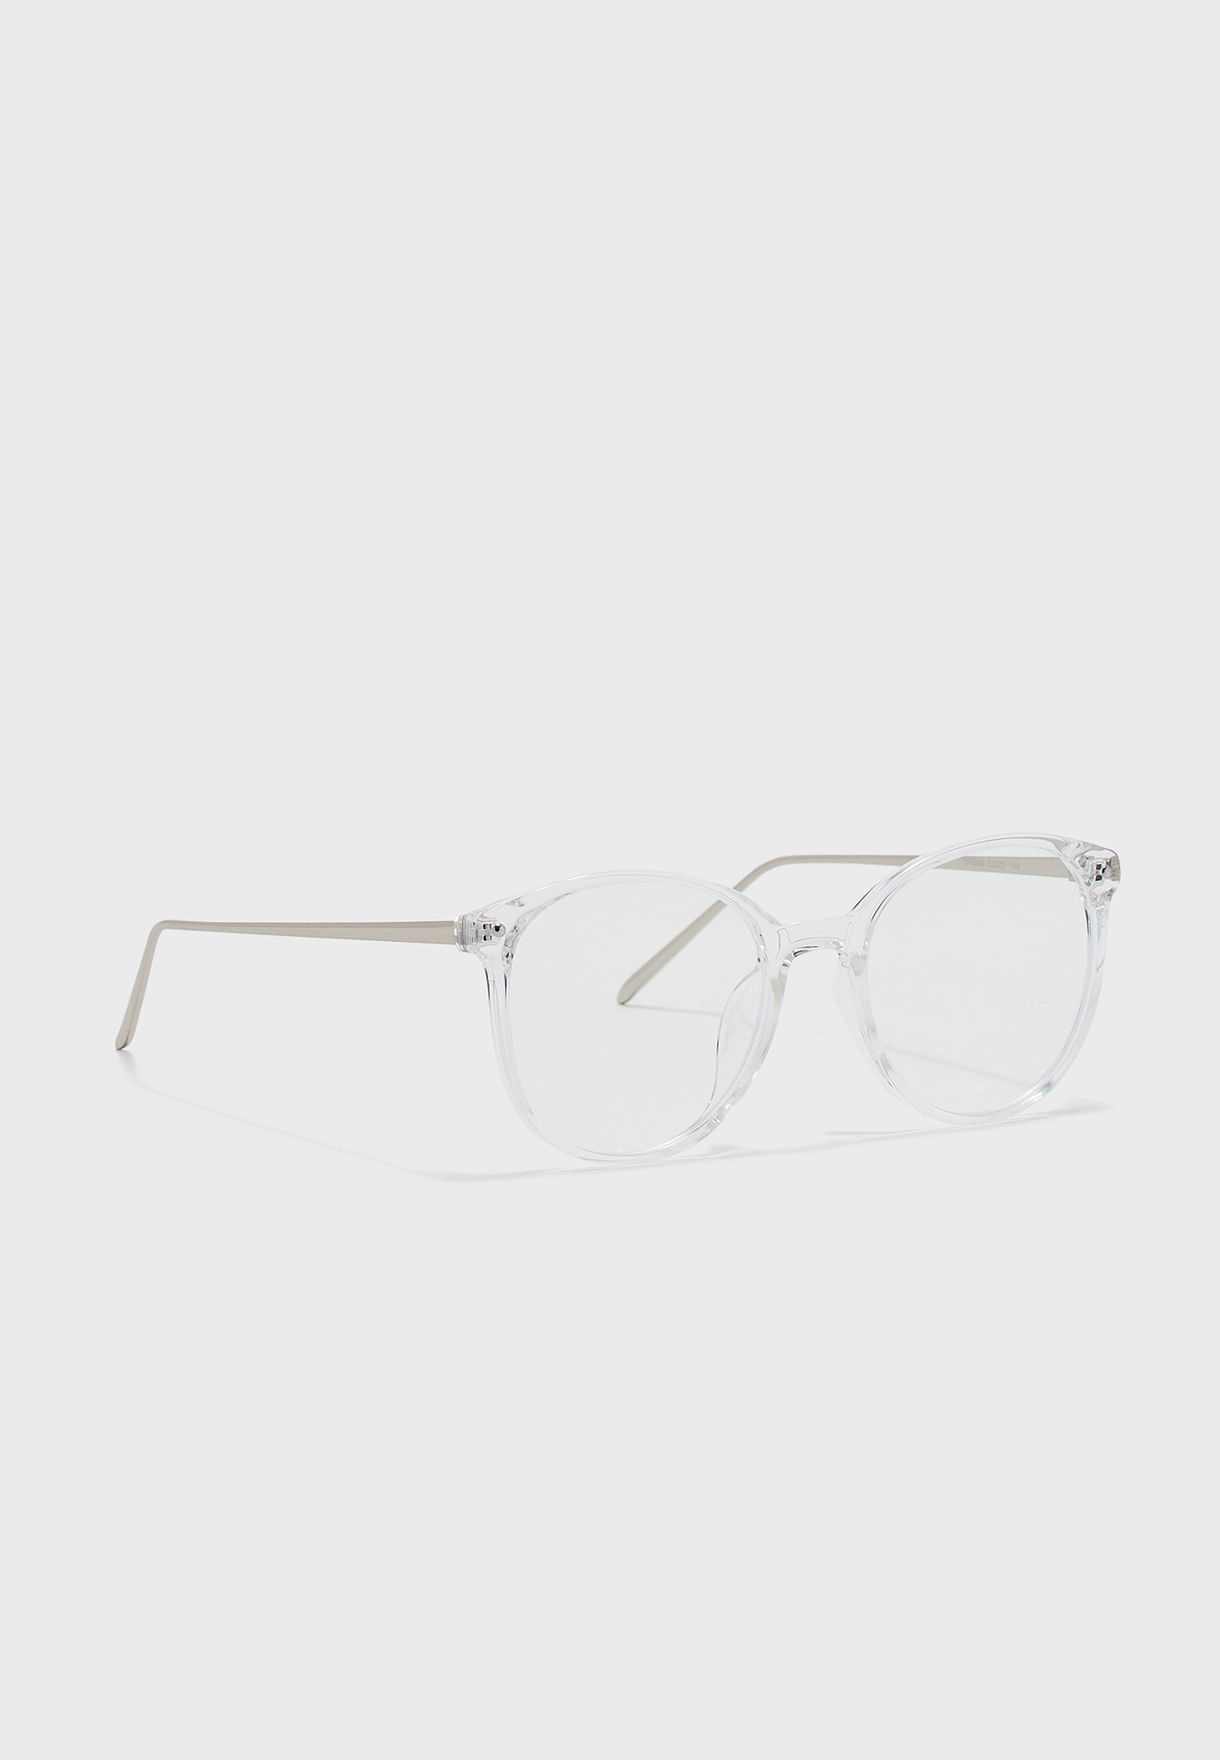 نظارة شمسية بأذرع معدنية